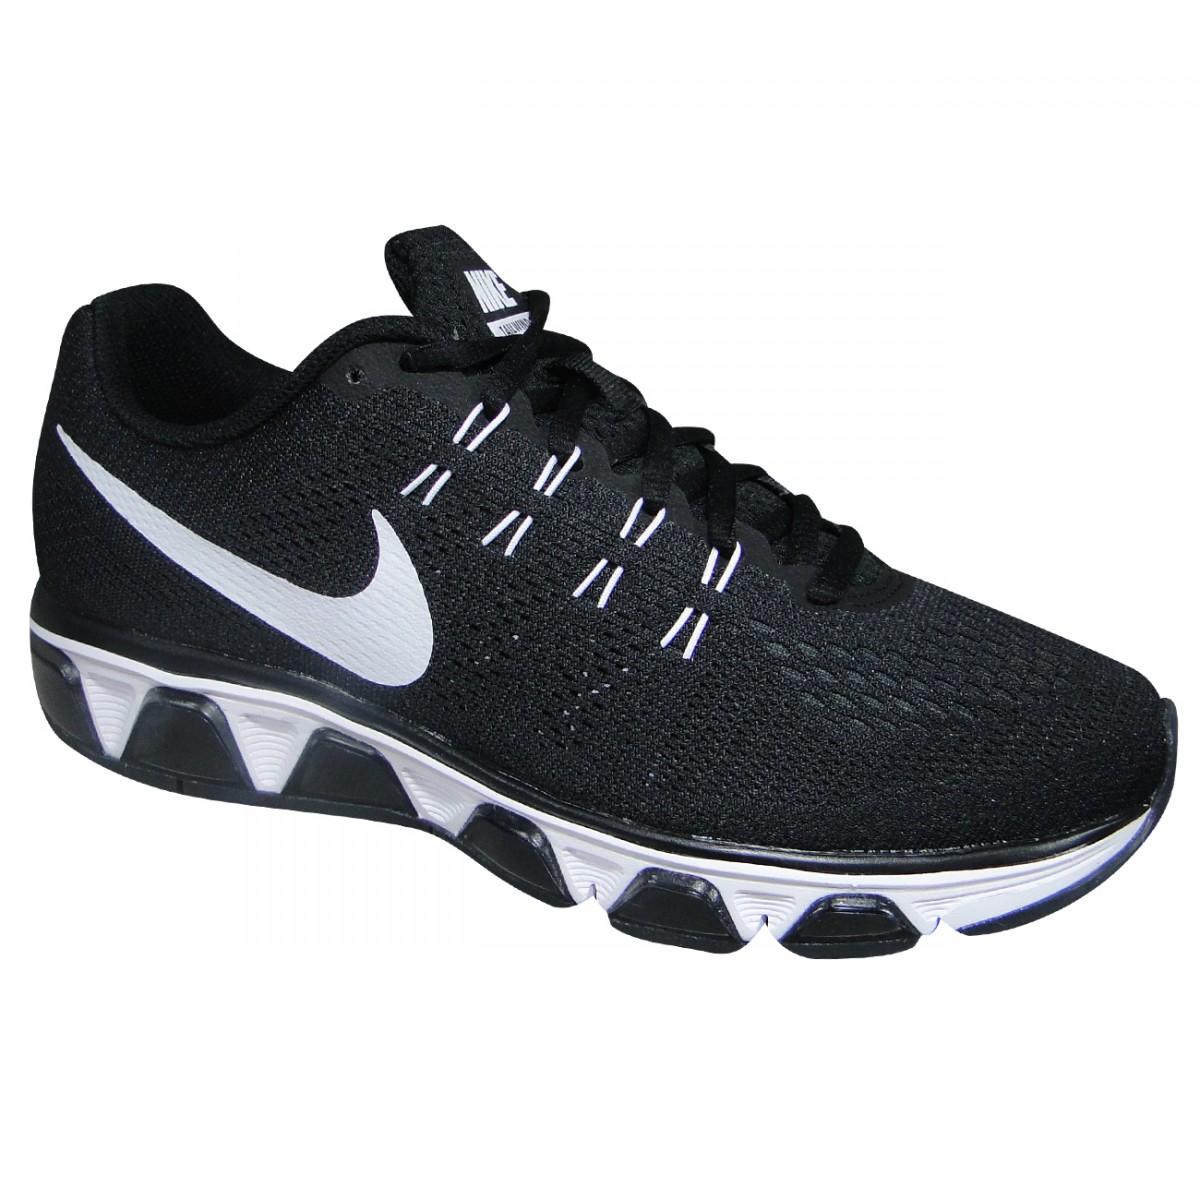 Tenis Nike Air Max Tailwind 8 805942 001 - Preto Branco - Chuteira Nike 23c512c0d5122